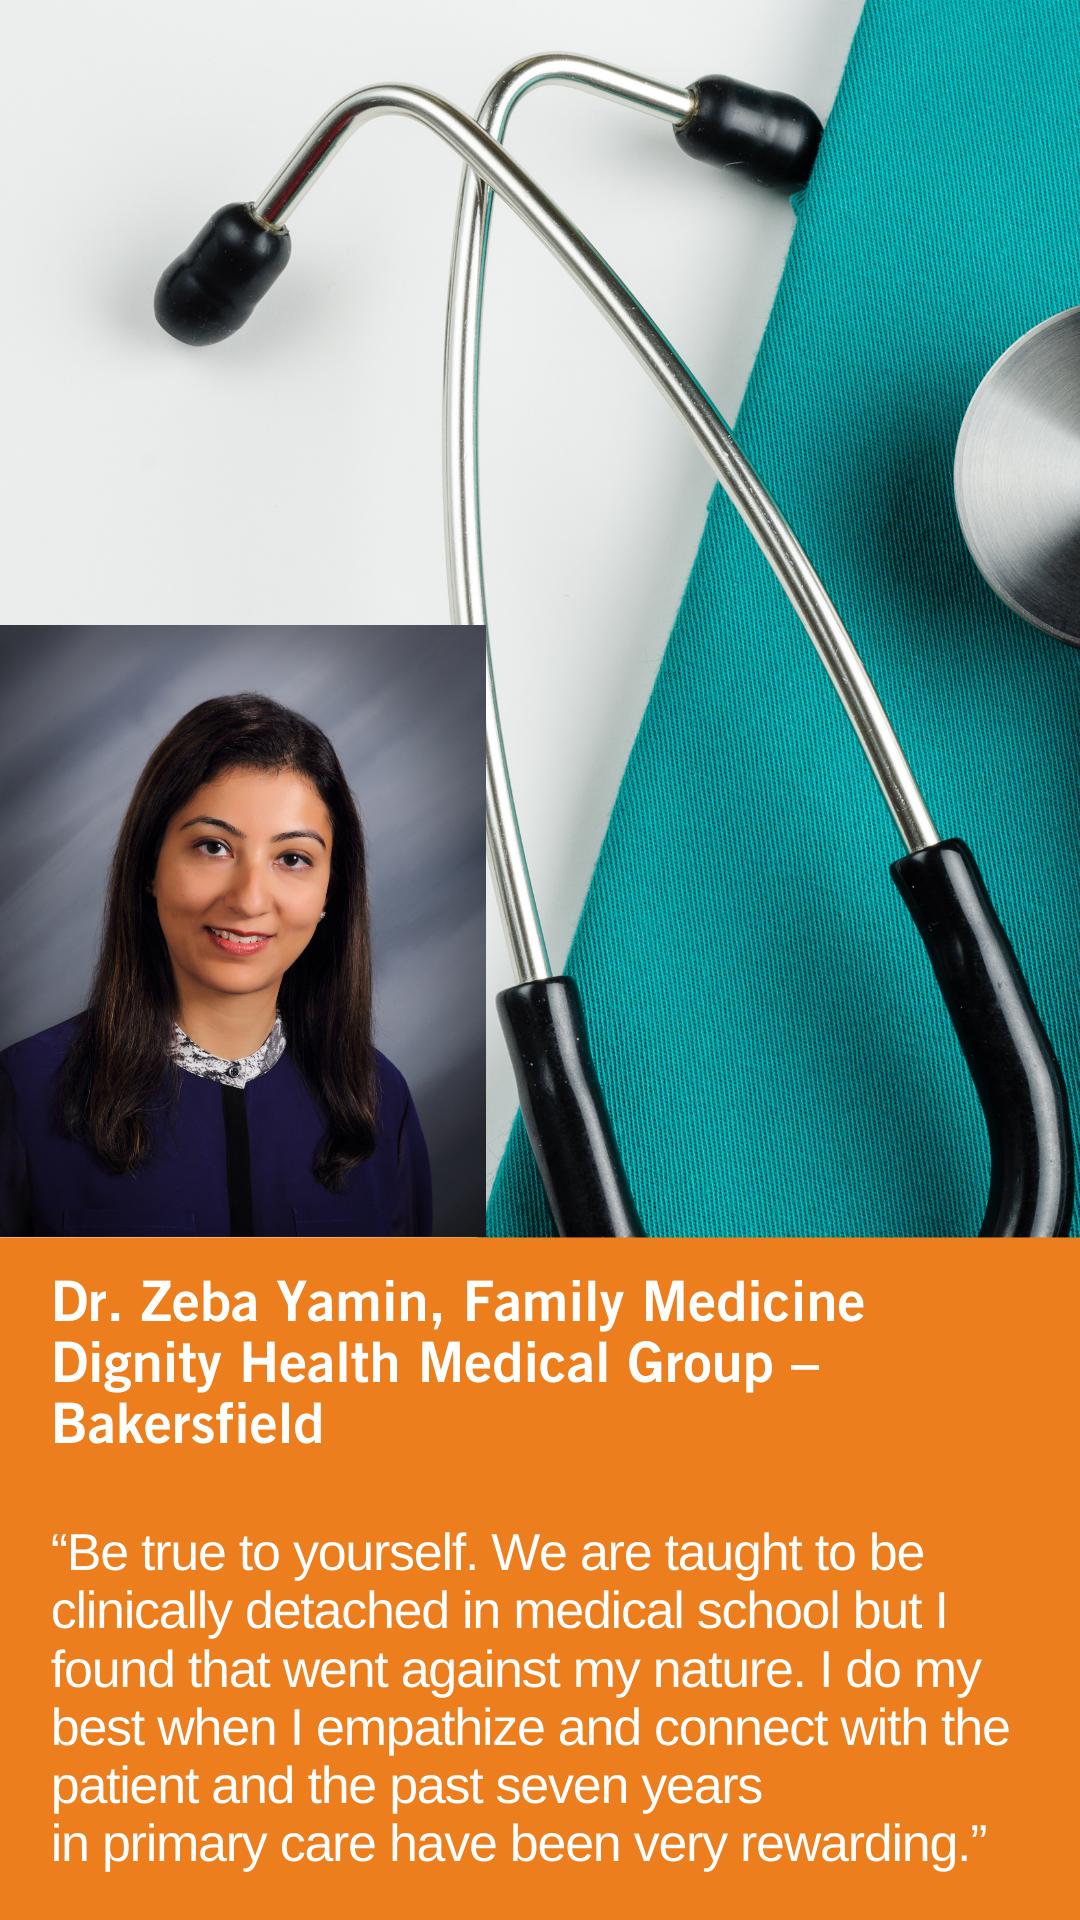 Zeba Yamin, MD, Family Medicine, Dignity Health Medical Group — Bakersfield